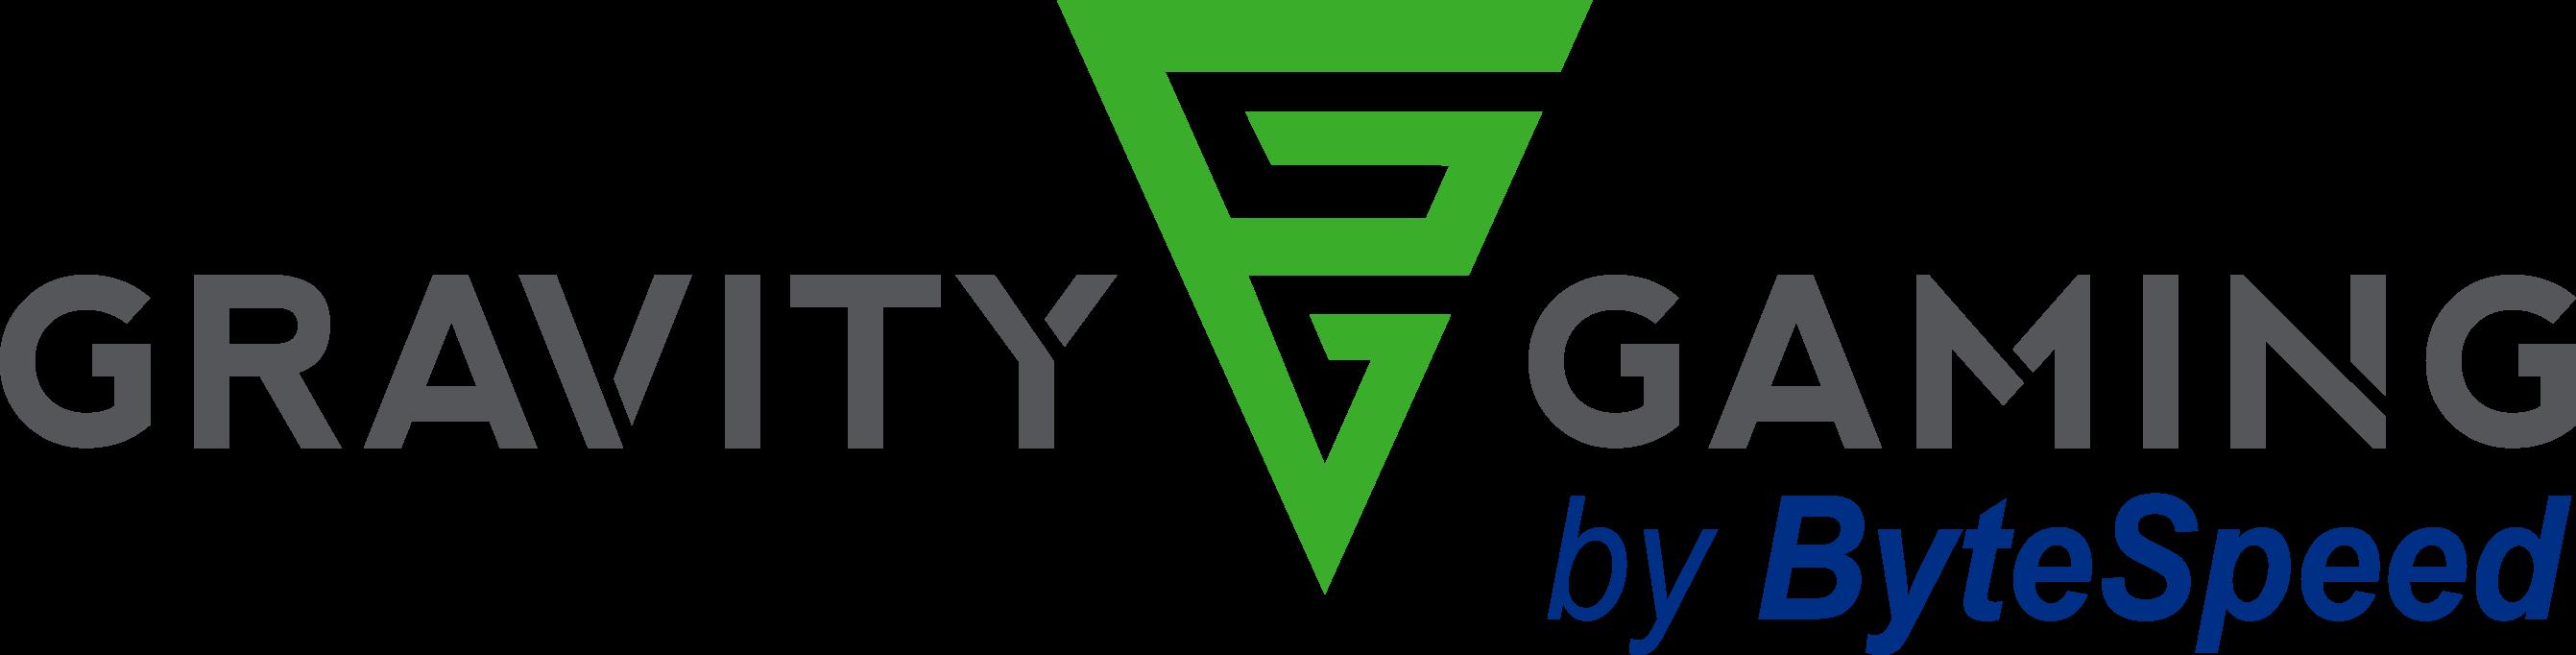 NAECAD Partner - Gravity Gaming by ByteSpeed